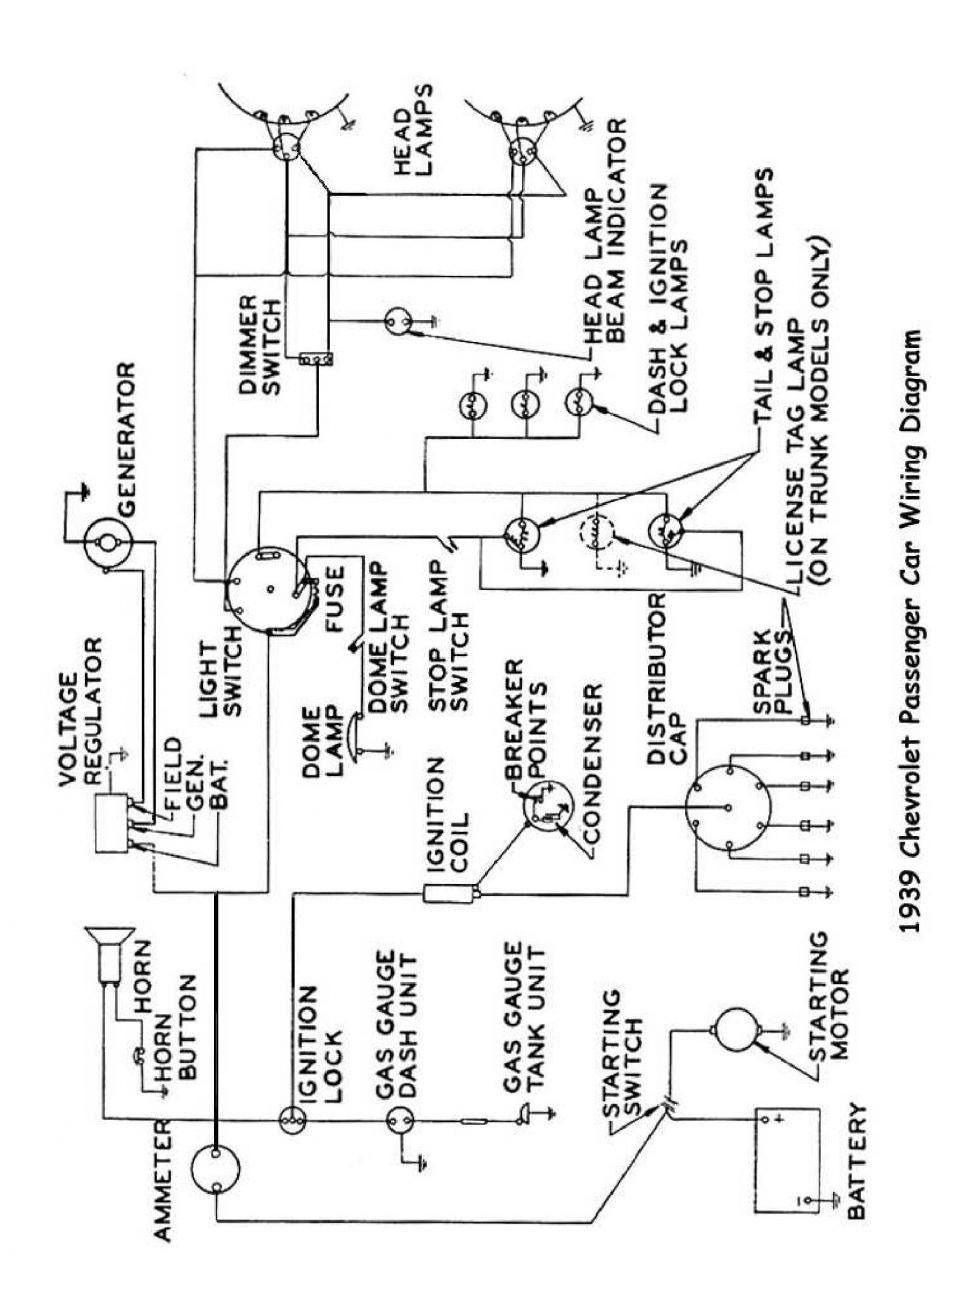 17 simple car wiring diagrams design , https://bacamajalah.com/17-simple-car -wiring-diagrams-design/ ,… | electrical wiring diagram, remote car starter,  car starter  pinterest